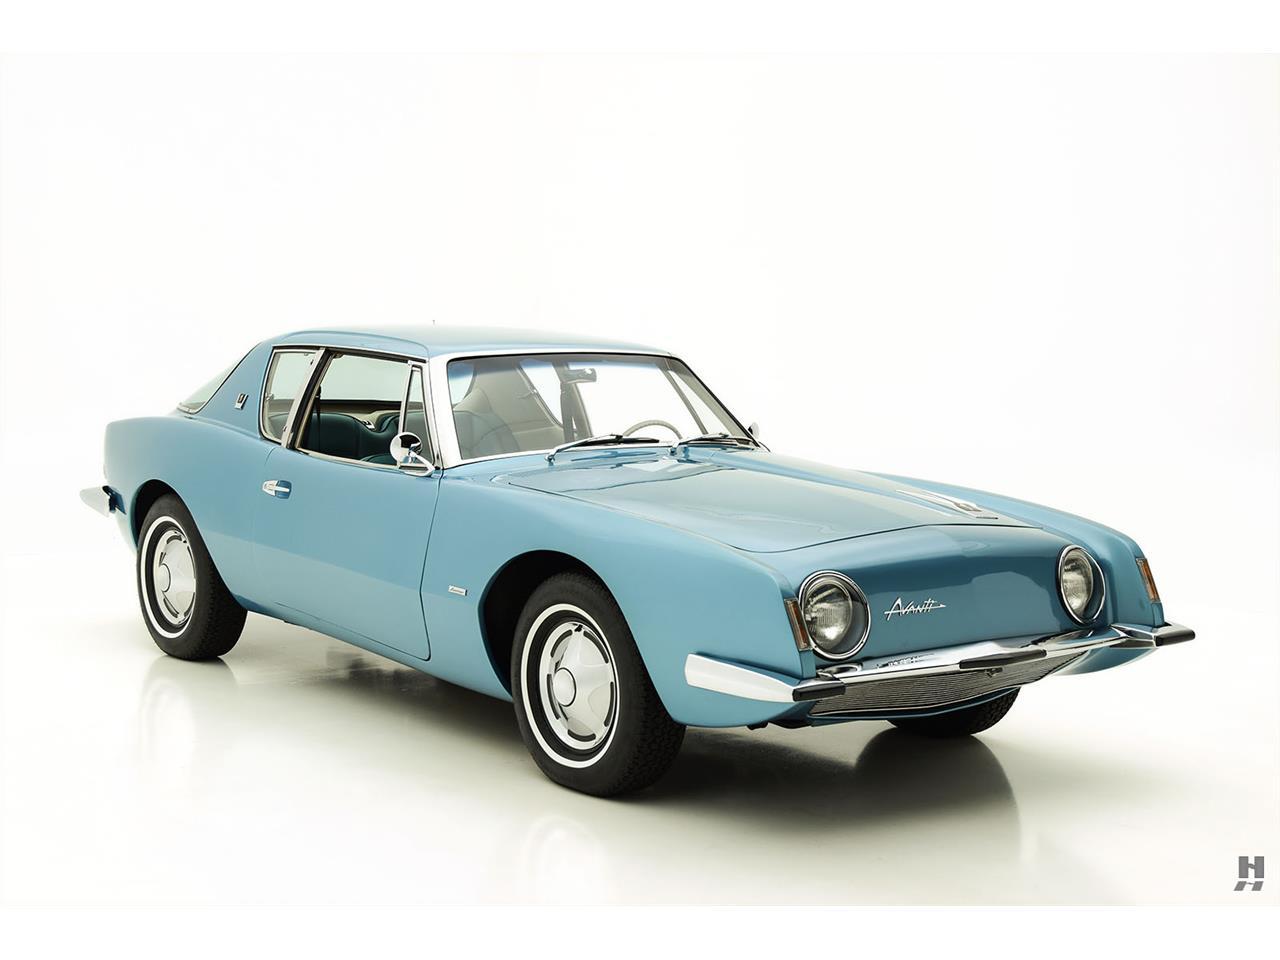 Large Picture of 1963 Studebaker Avanti located in Saint Louis Missouri - $77,500.00 - MGHN